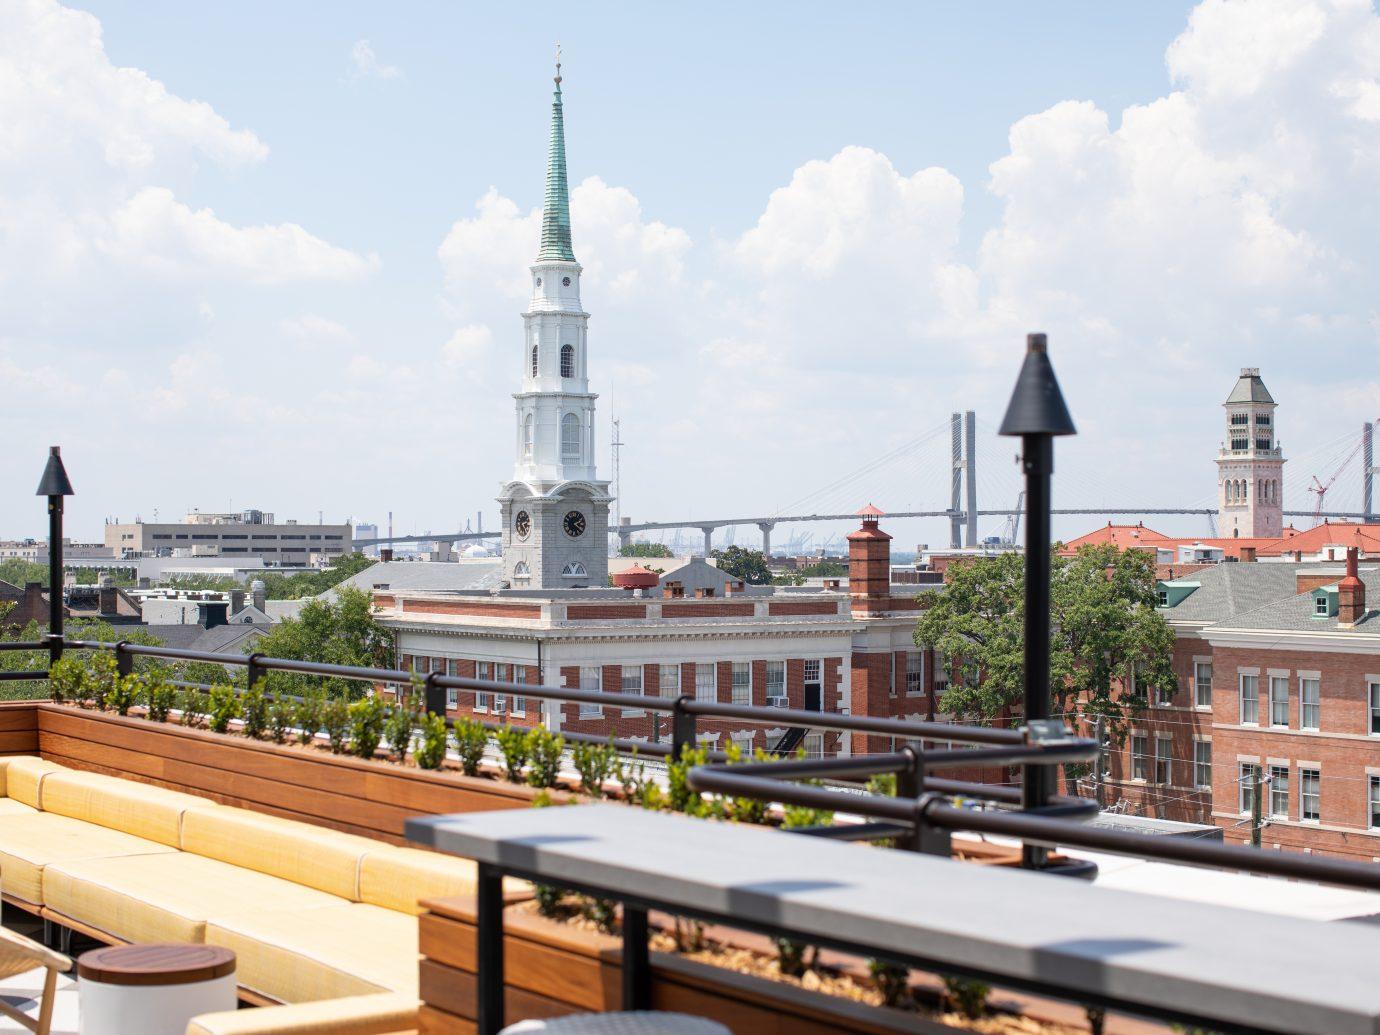 Peregrin Rooftop Pool & Bar at the Perry Lane Hotel, Savannah